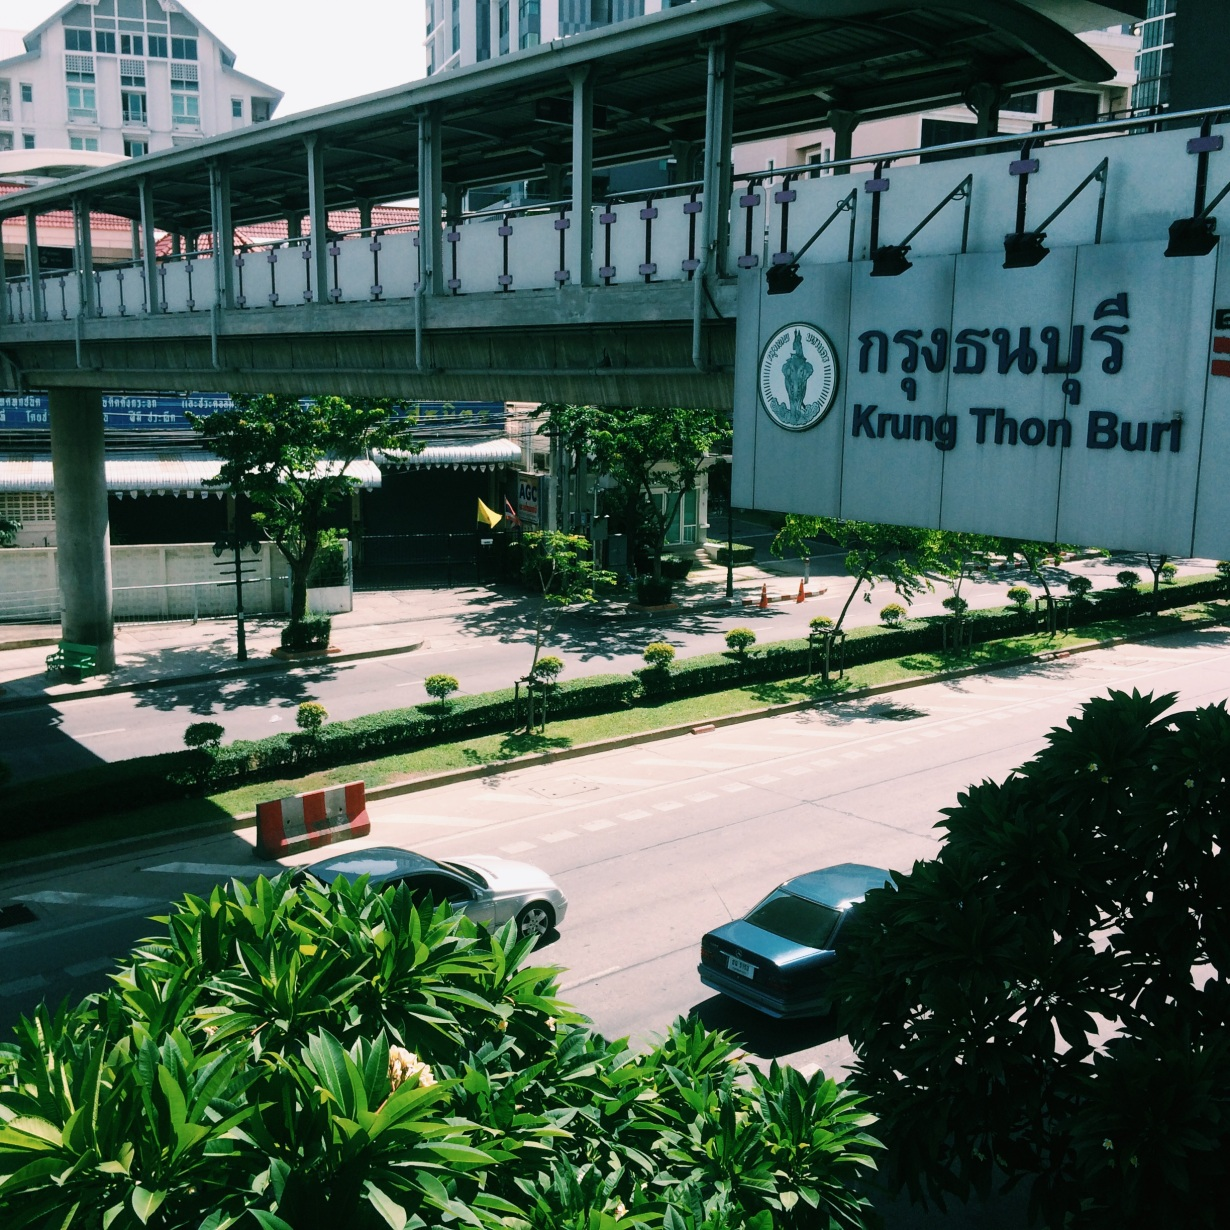 My BTS stop - Krung Thonburi